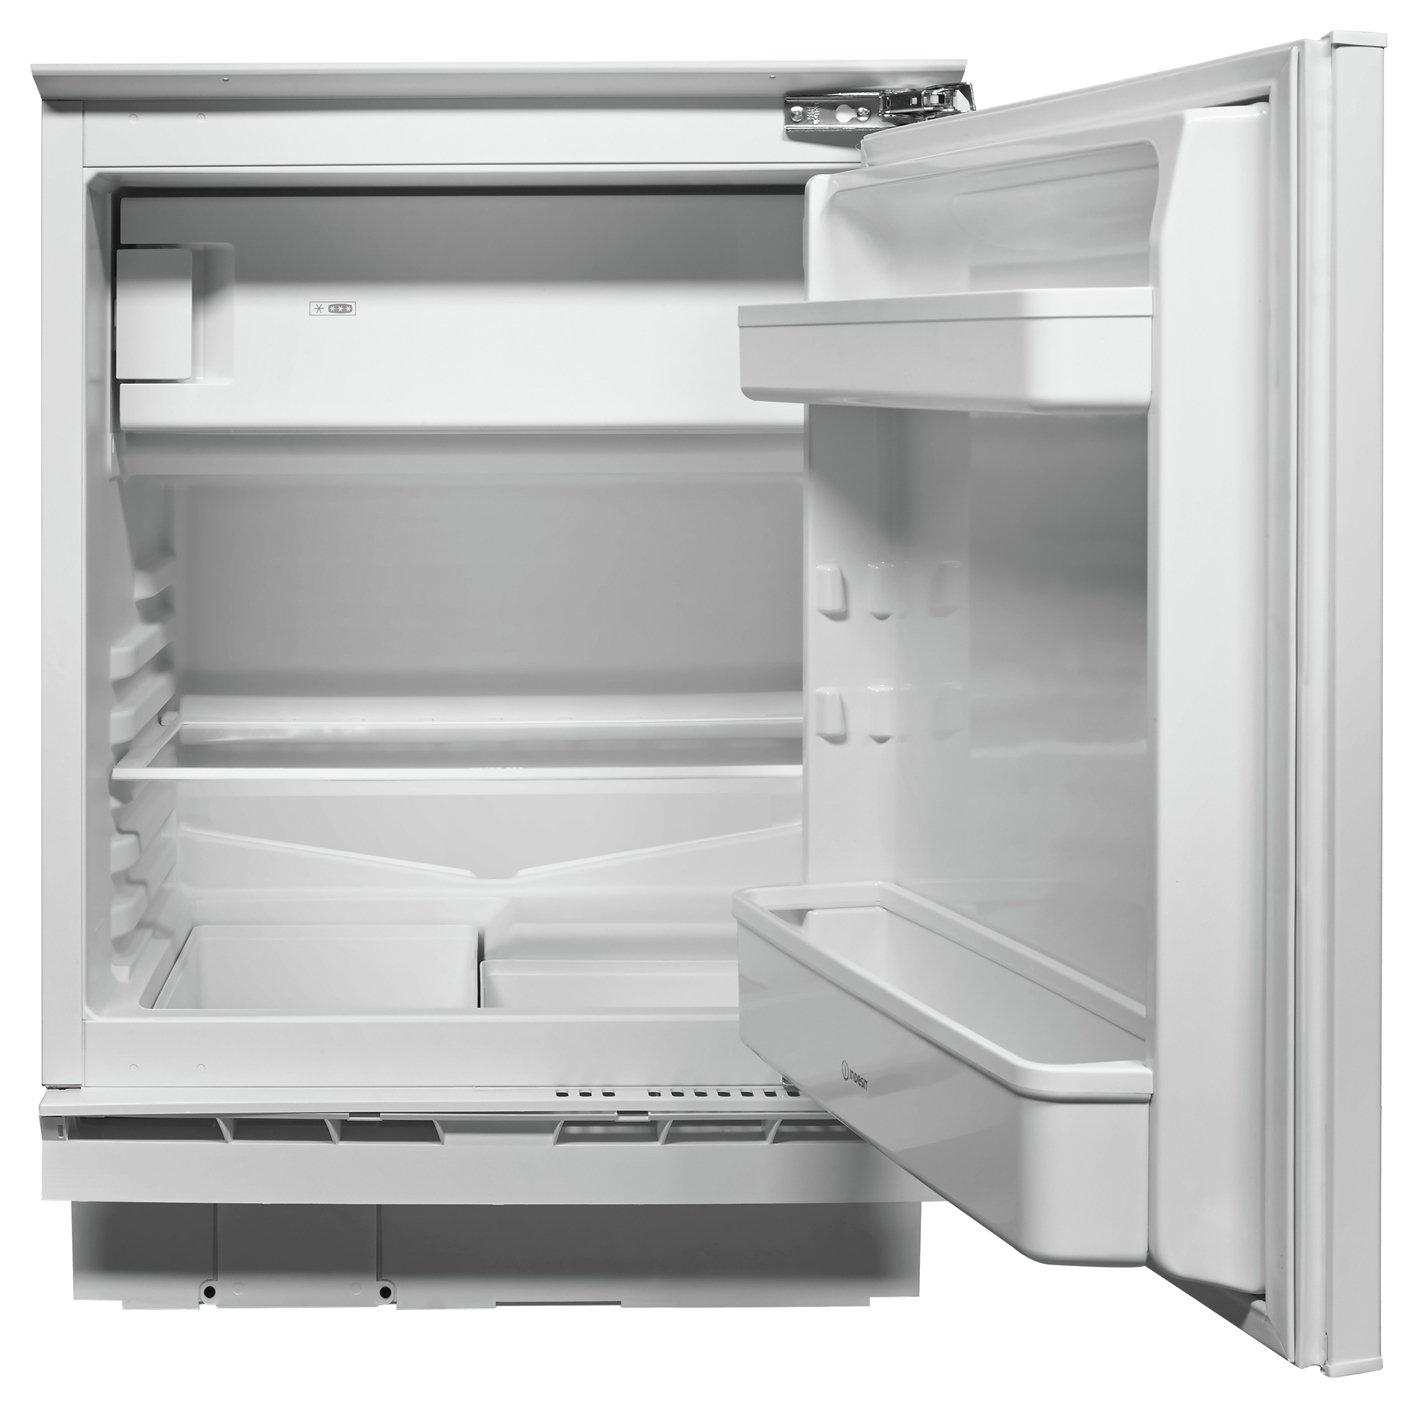 indesit-ifa1-under-counter-fridge-white